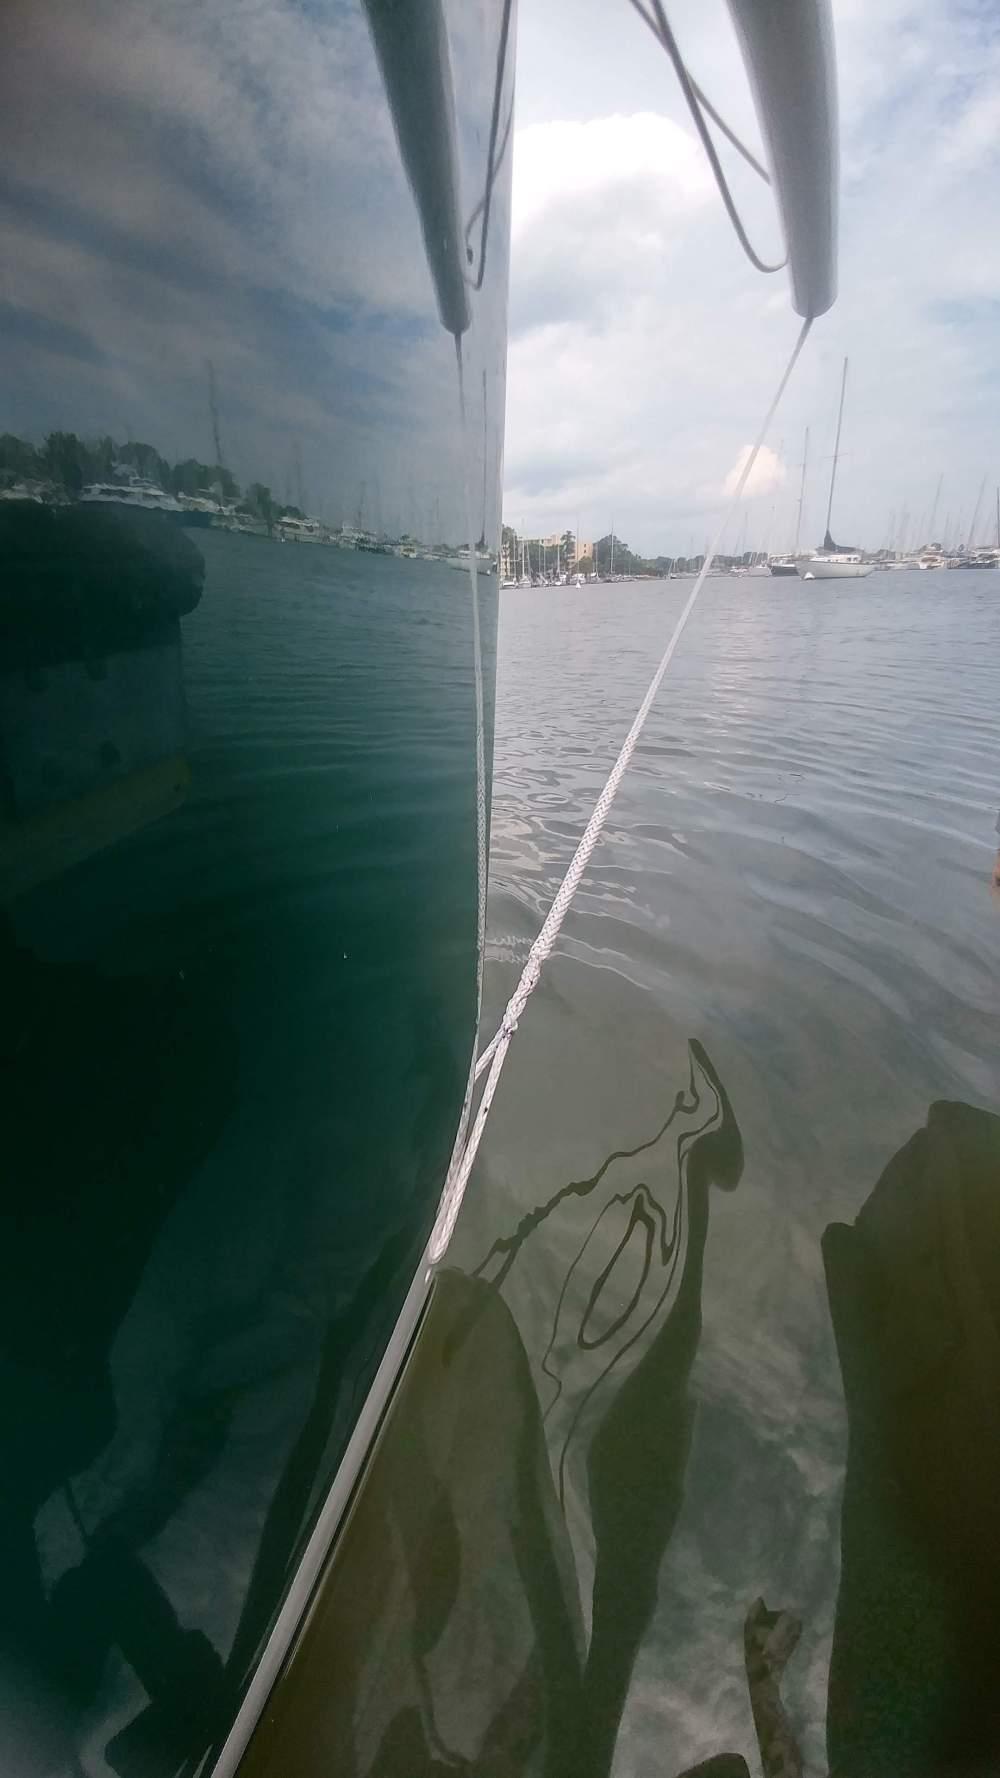 J 100 retractable bow sprit